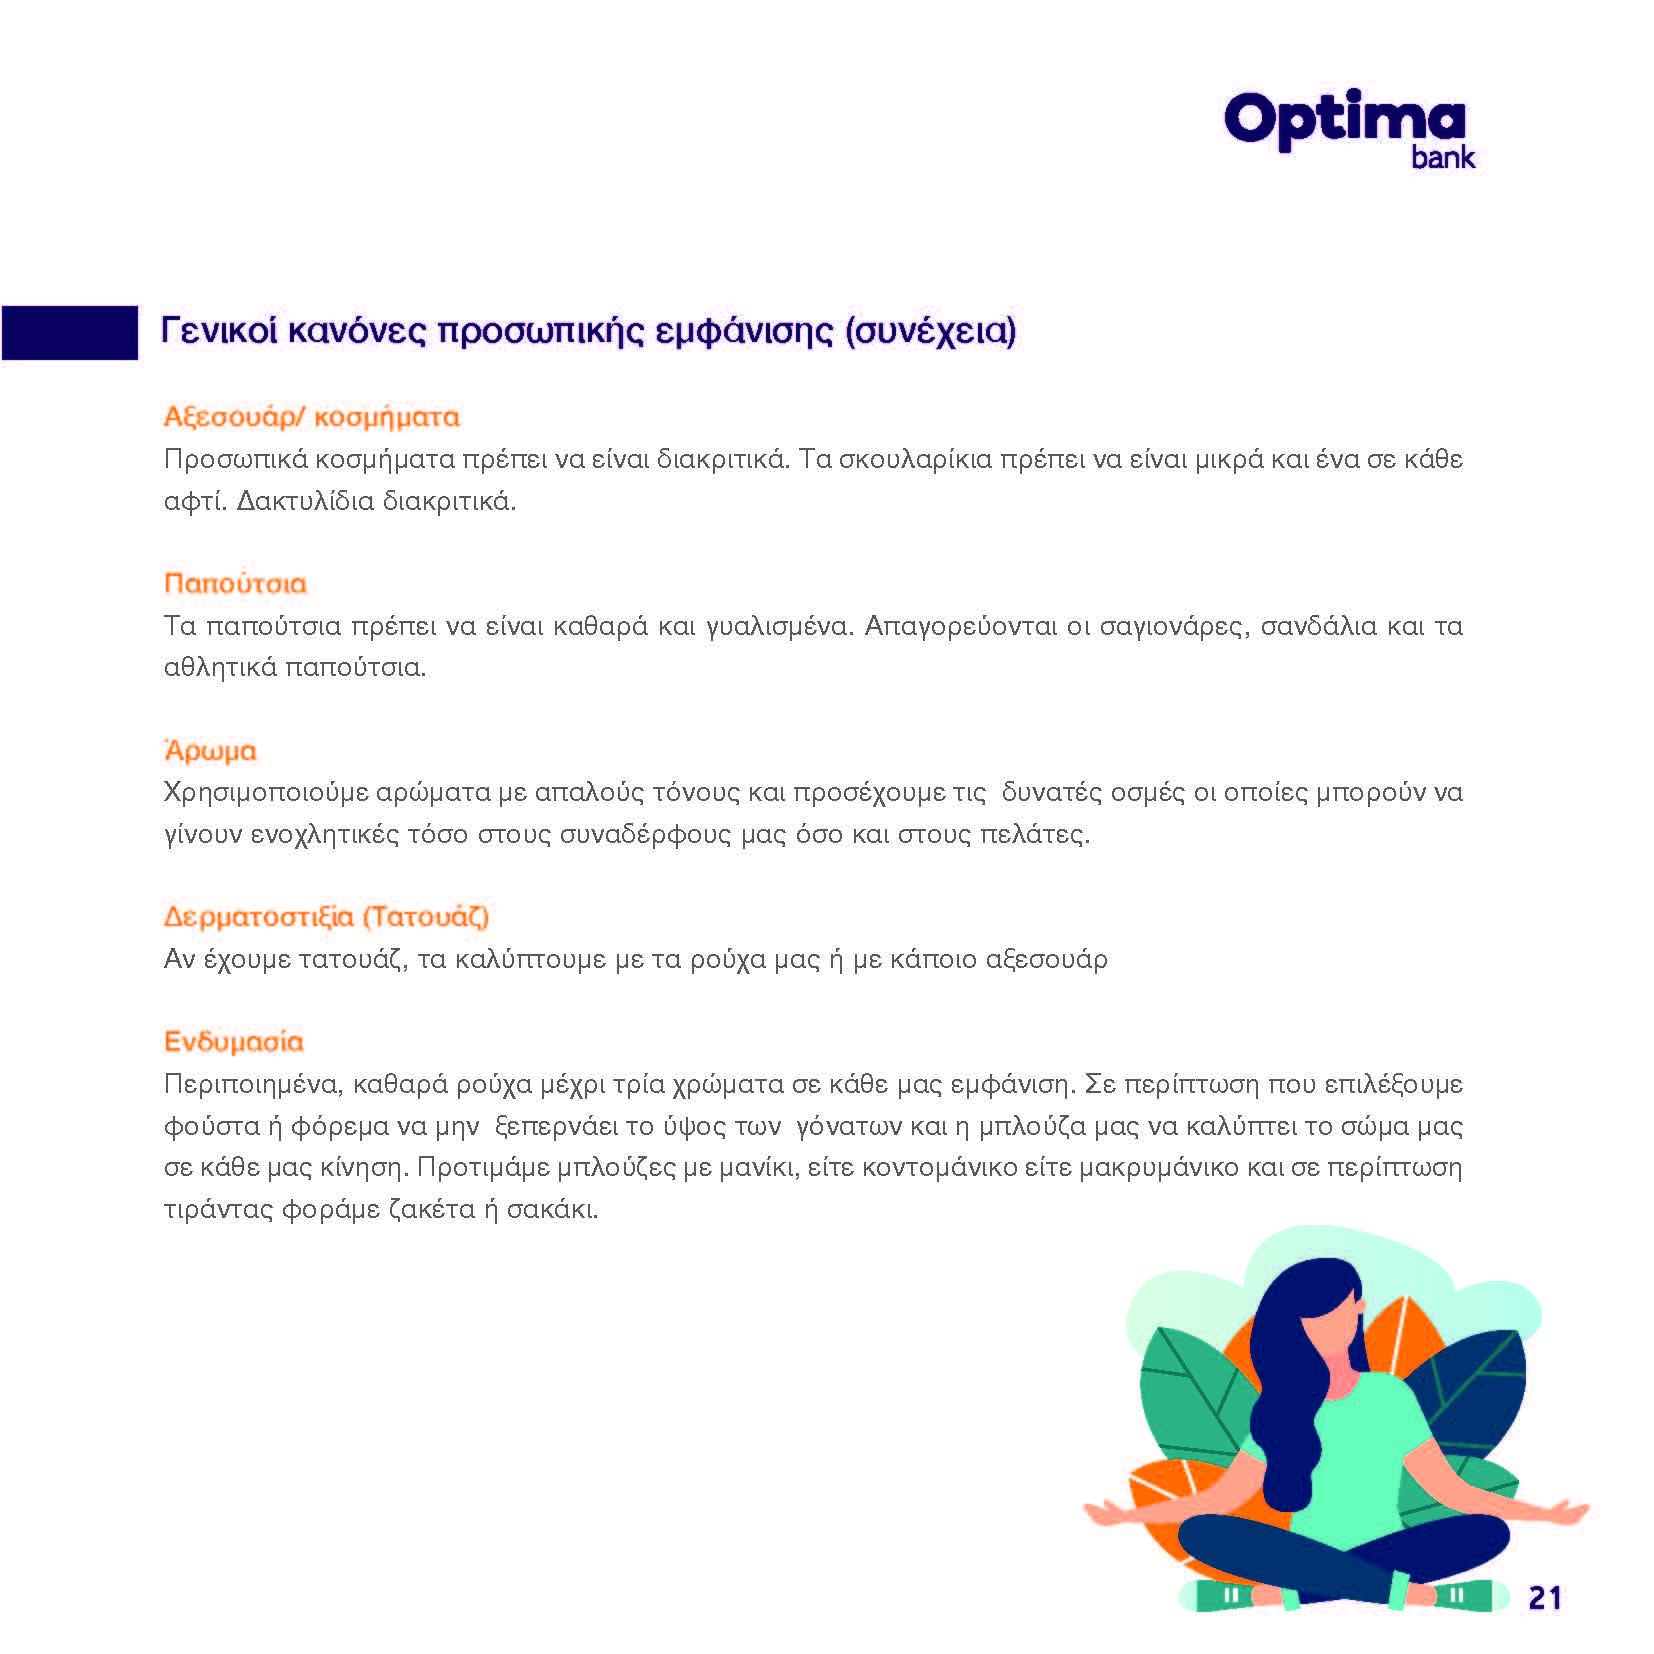 https://www.jib.gr/wp-content/uploads/2020/09/OPTIMA-BANK-BOOKLET-WEB_Page_021.jpg